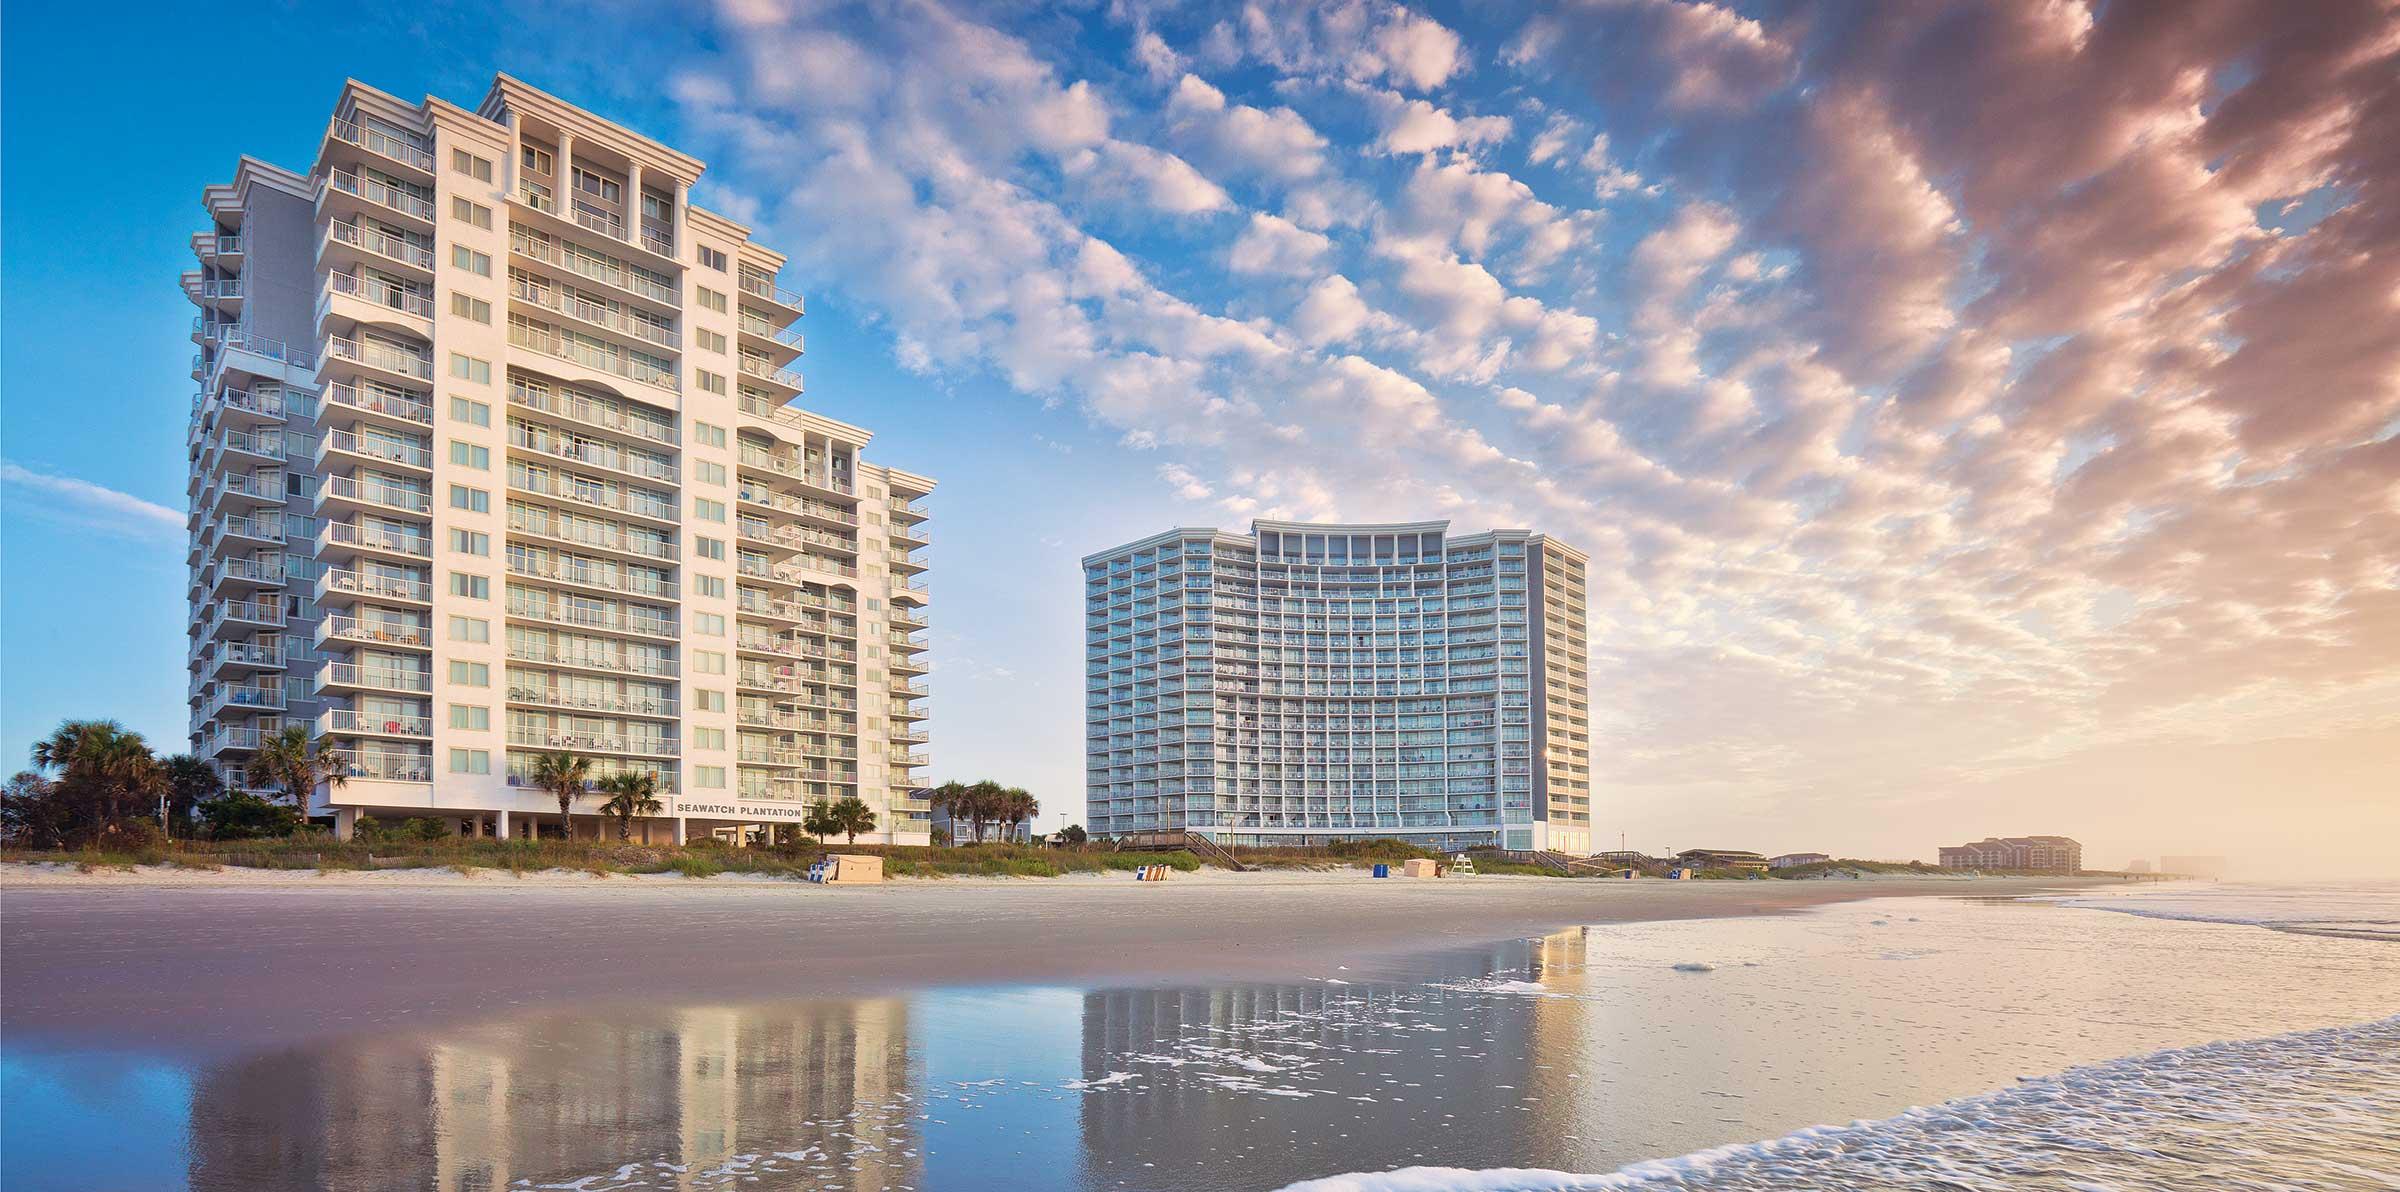 Apartment Seawatch Plantation 2 Bedrooms 2 Bathrooms photo 20365208